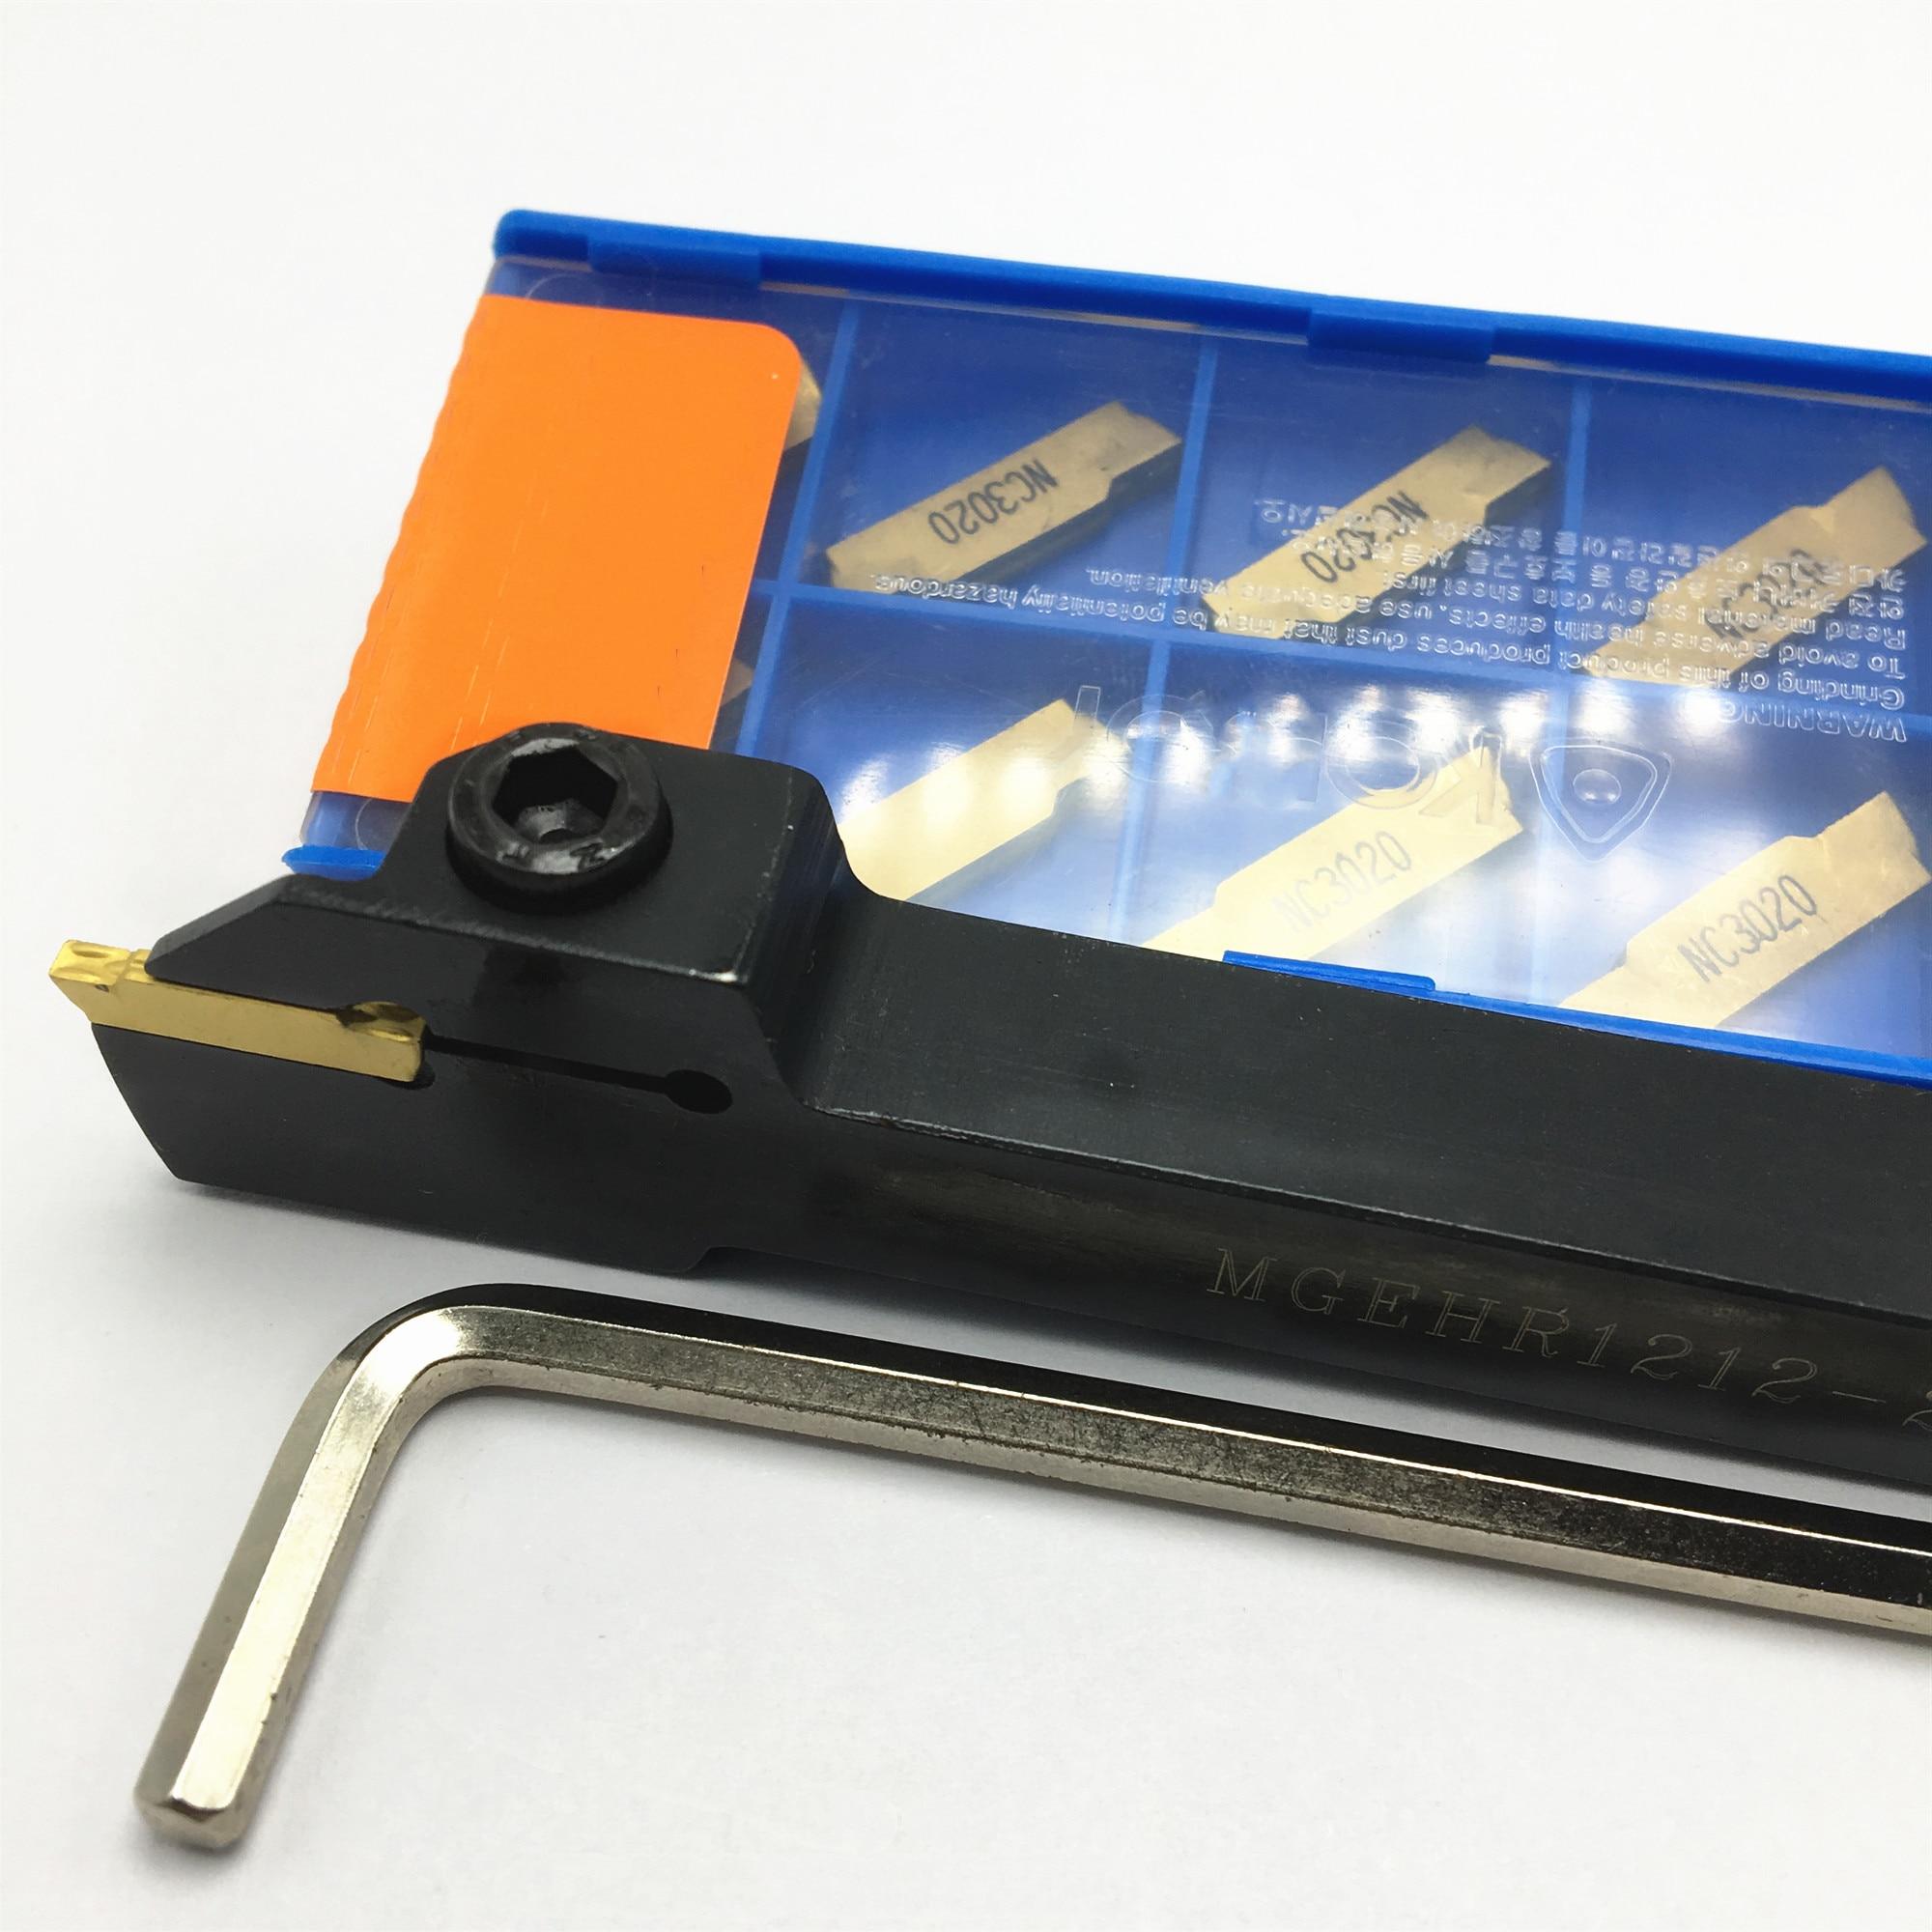 MGEHR1010 MGEHR1212 MGEHR1616 MGEHR2020 MGEHR2525 External Grooving Tool Holder Carbide Insert CNC Lathe Turning Separation Tool